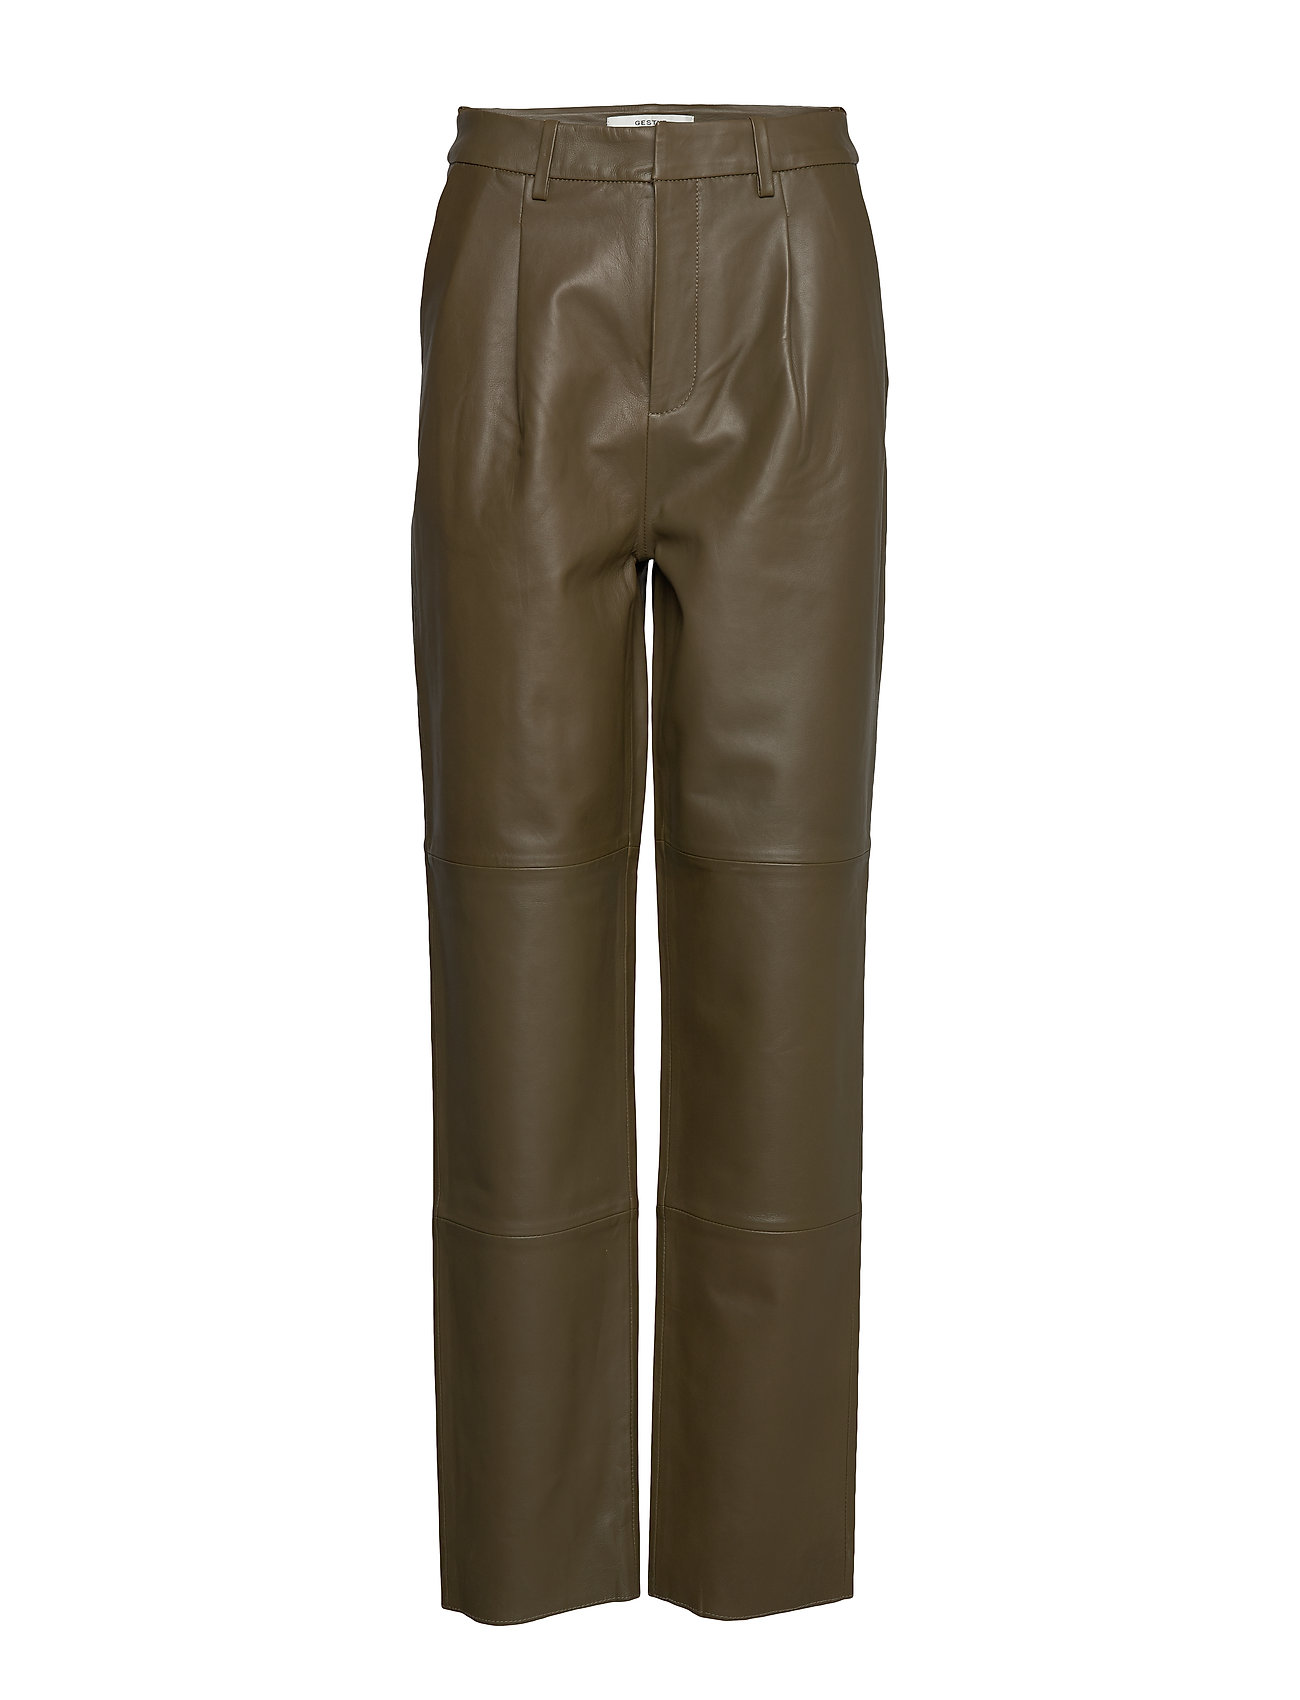 Image of Laliagz Pants Ms20 Leather Leggings/Bukser Grøn Gestuz (3339884785)